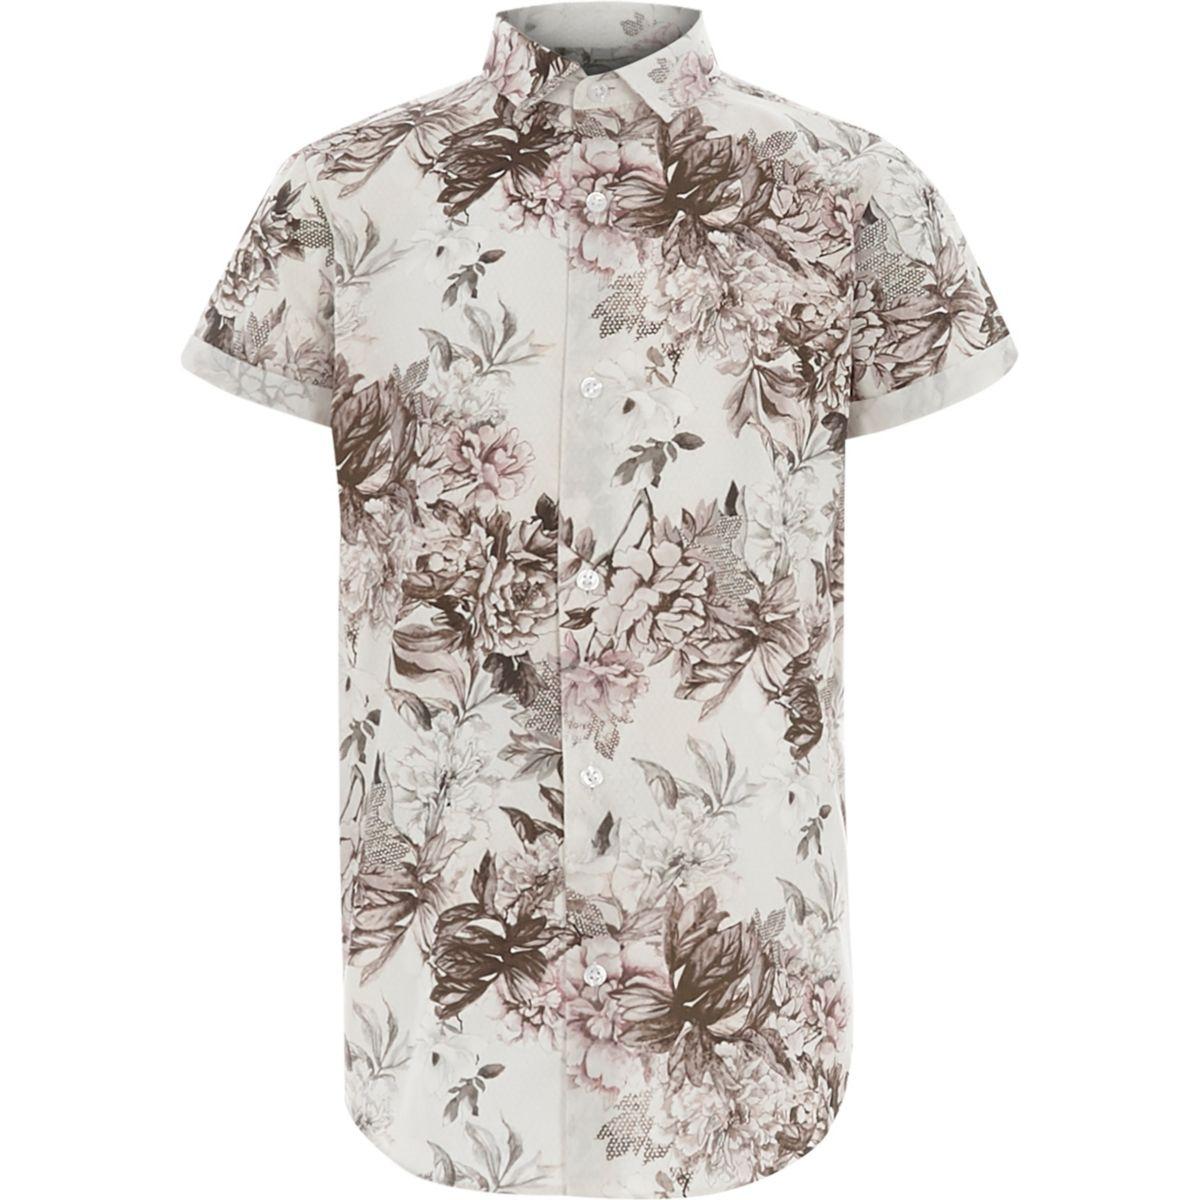 Boys white floral print short sleeve shirt